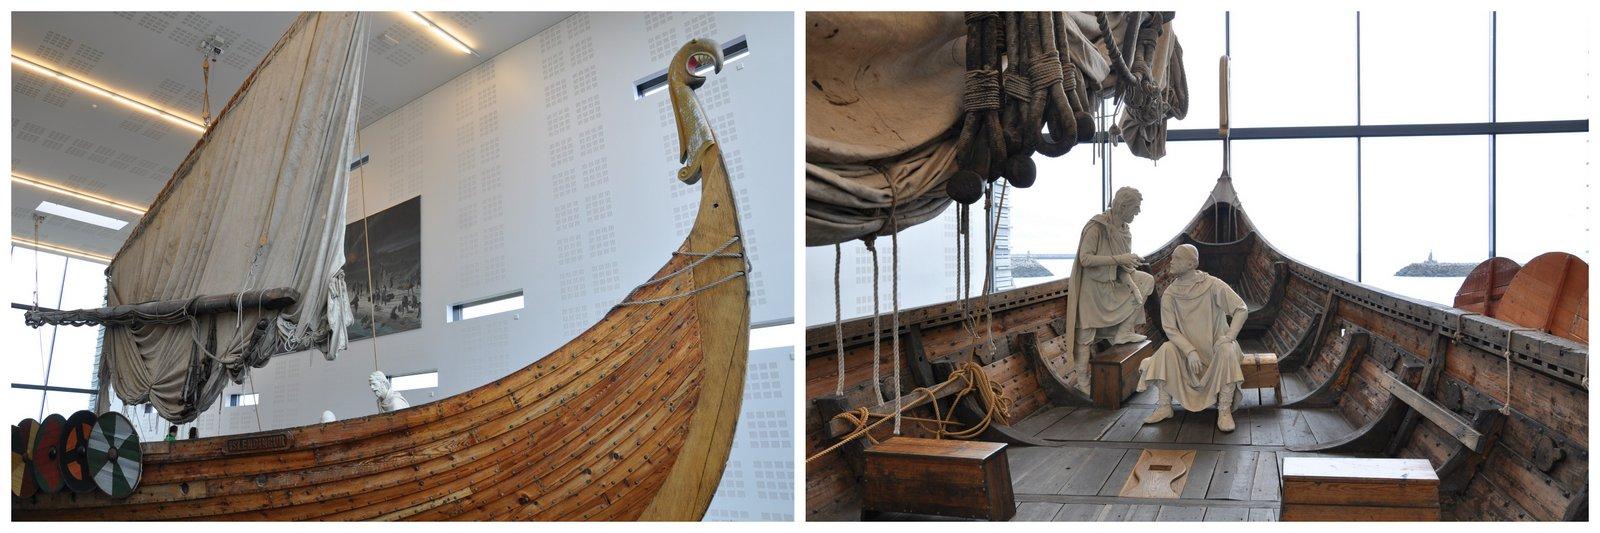 visiter-keflavik-musee-viking-islendingur